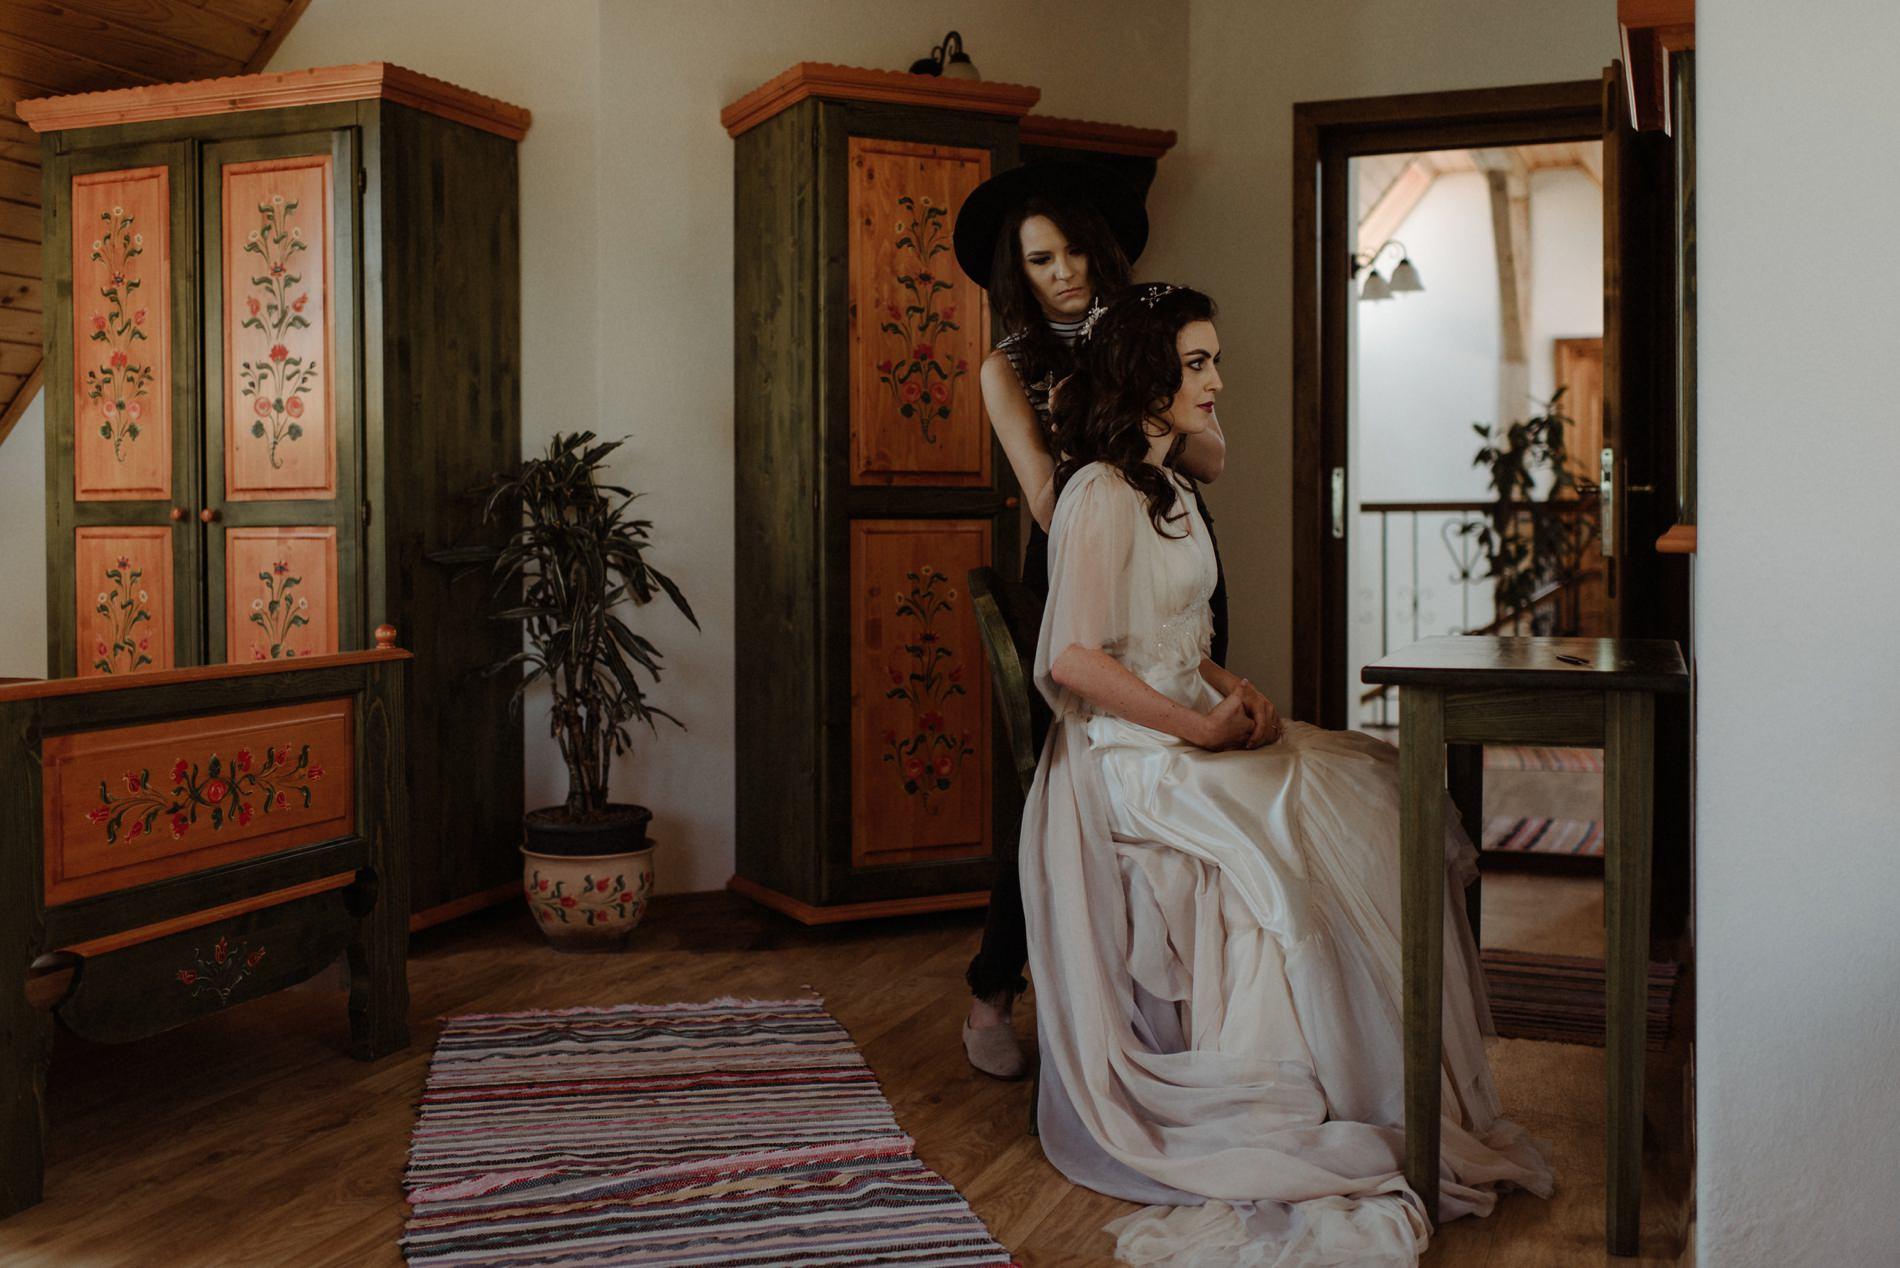 wedding in Transylvaniawedding in Transylvania